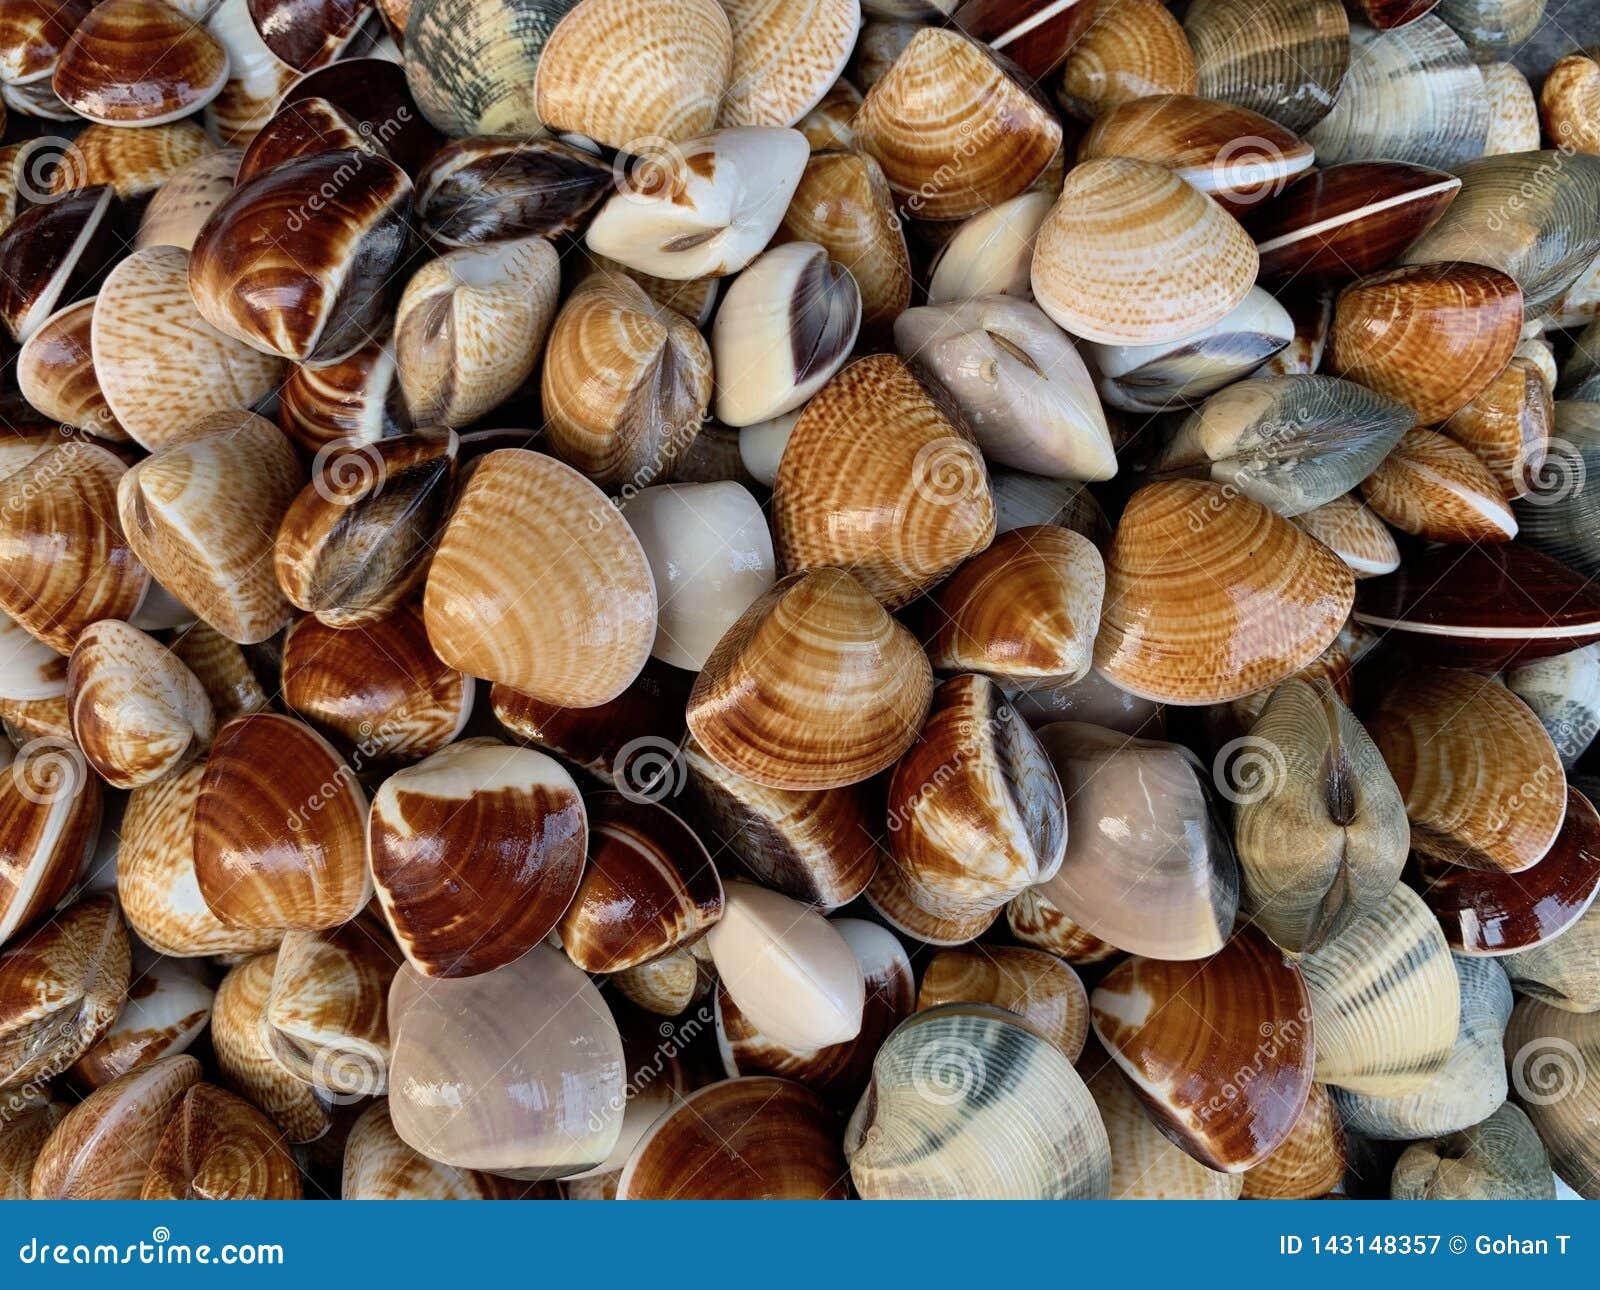 Fresh Shellfish as natural wallpaper and background, seafood